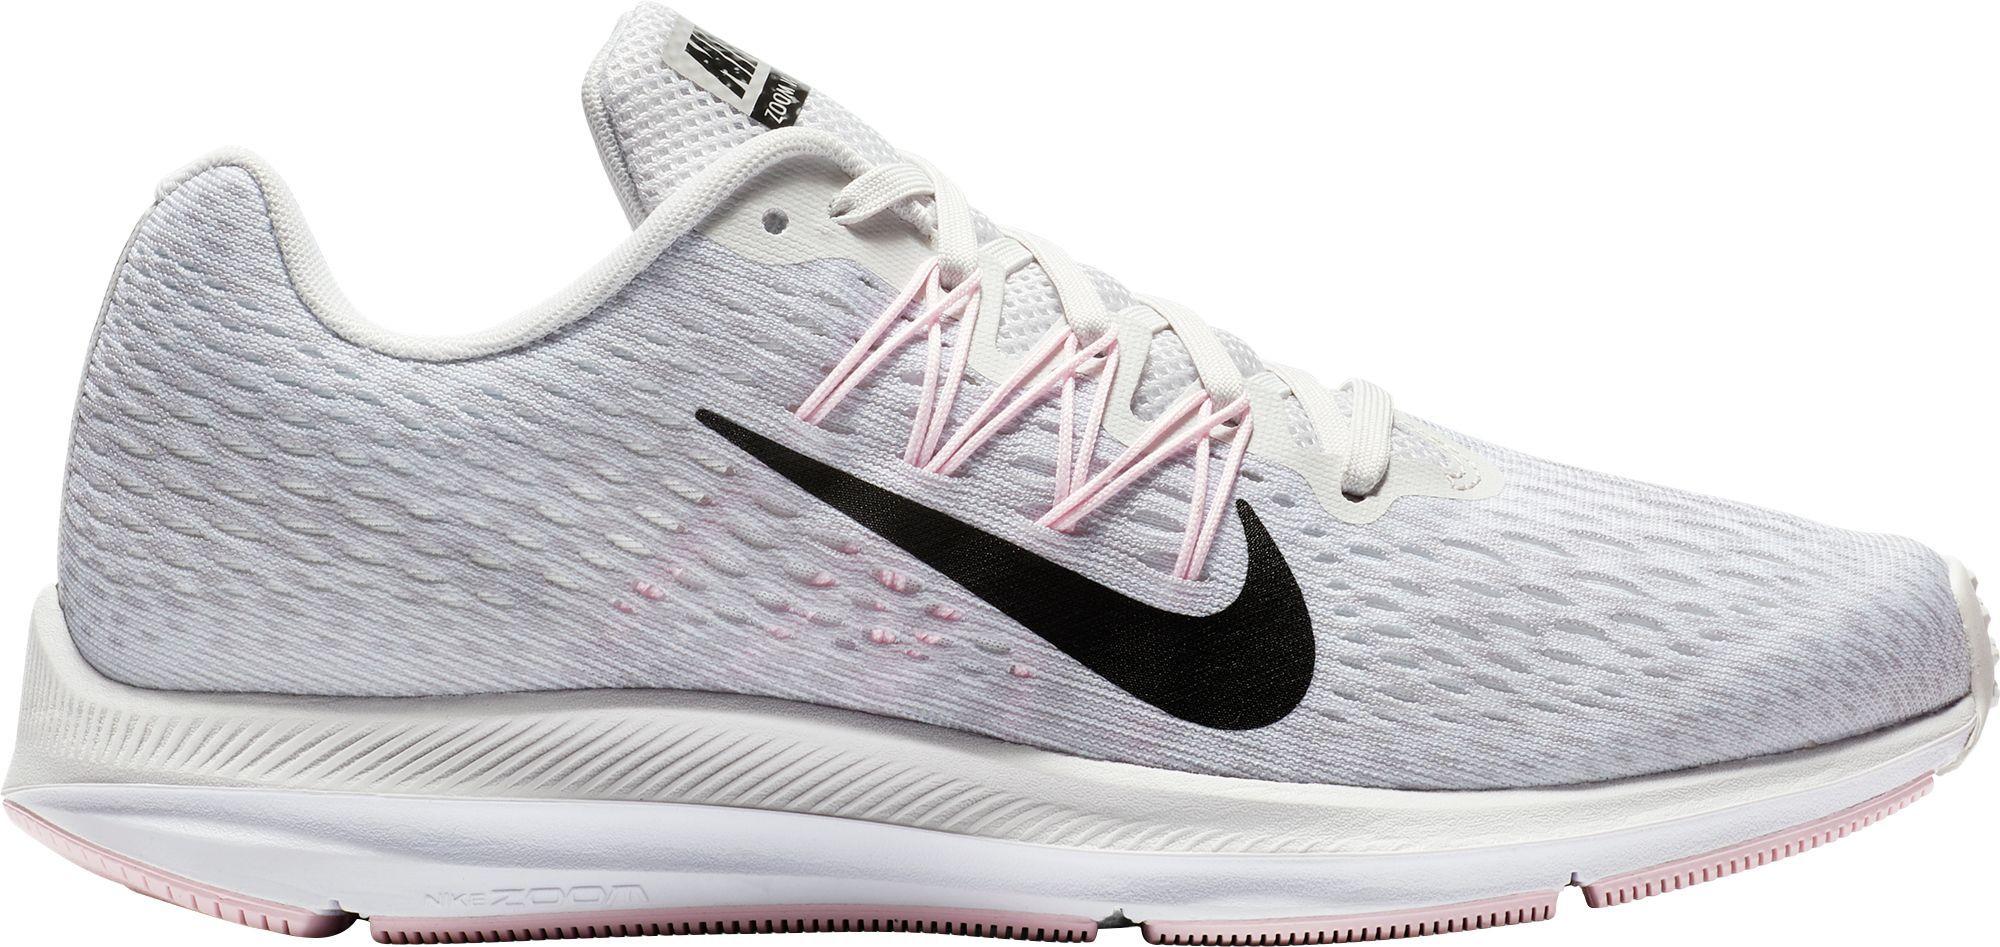 Nike Air Zoom Winflo 5 Women